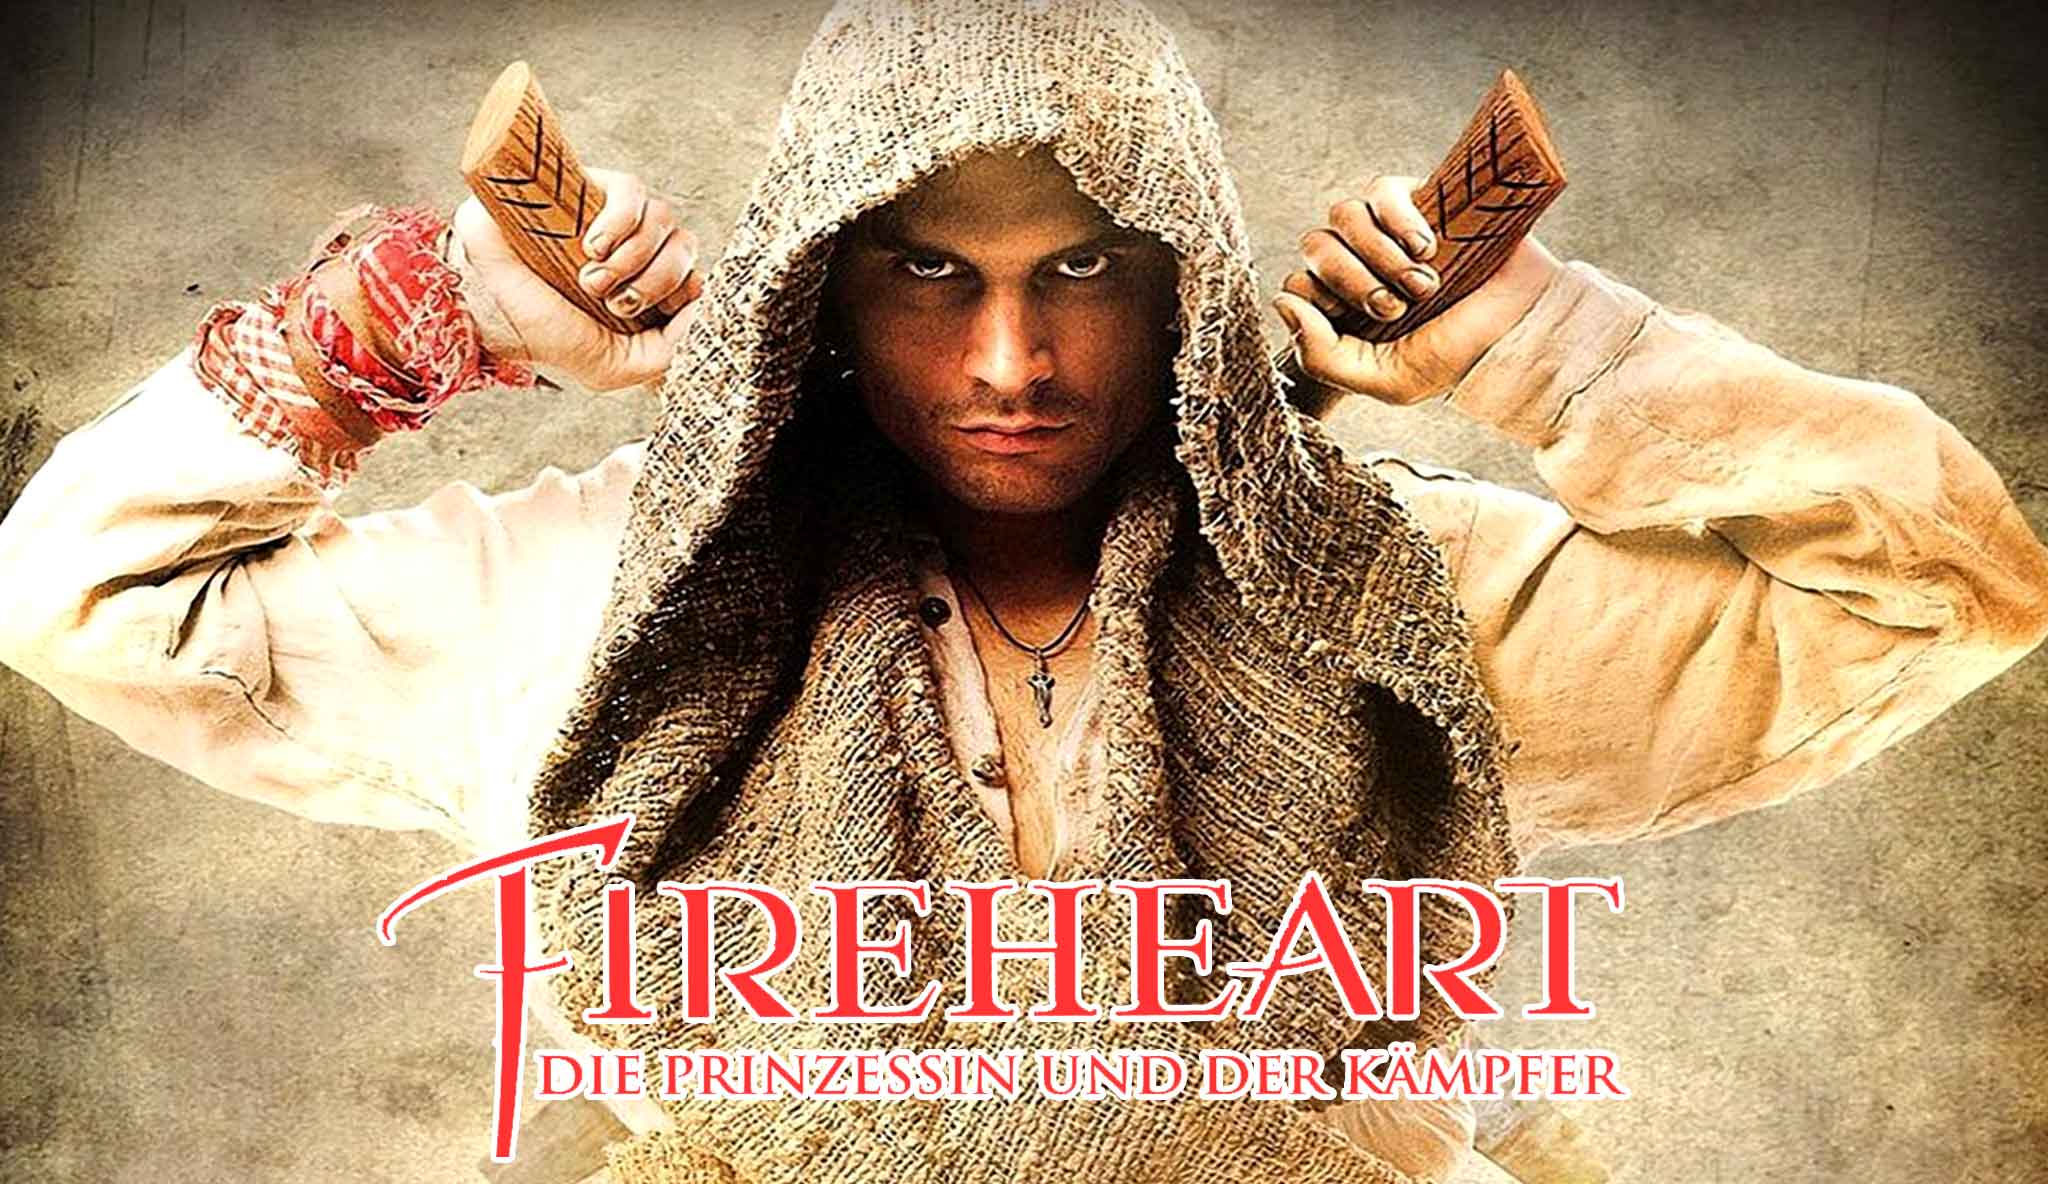 fireheart-tadas-blindas\header.jpg